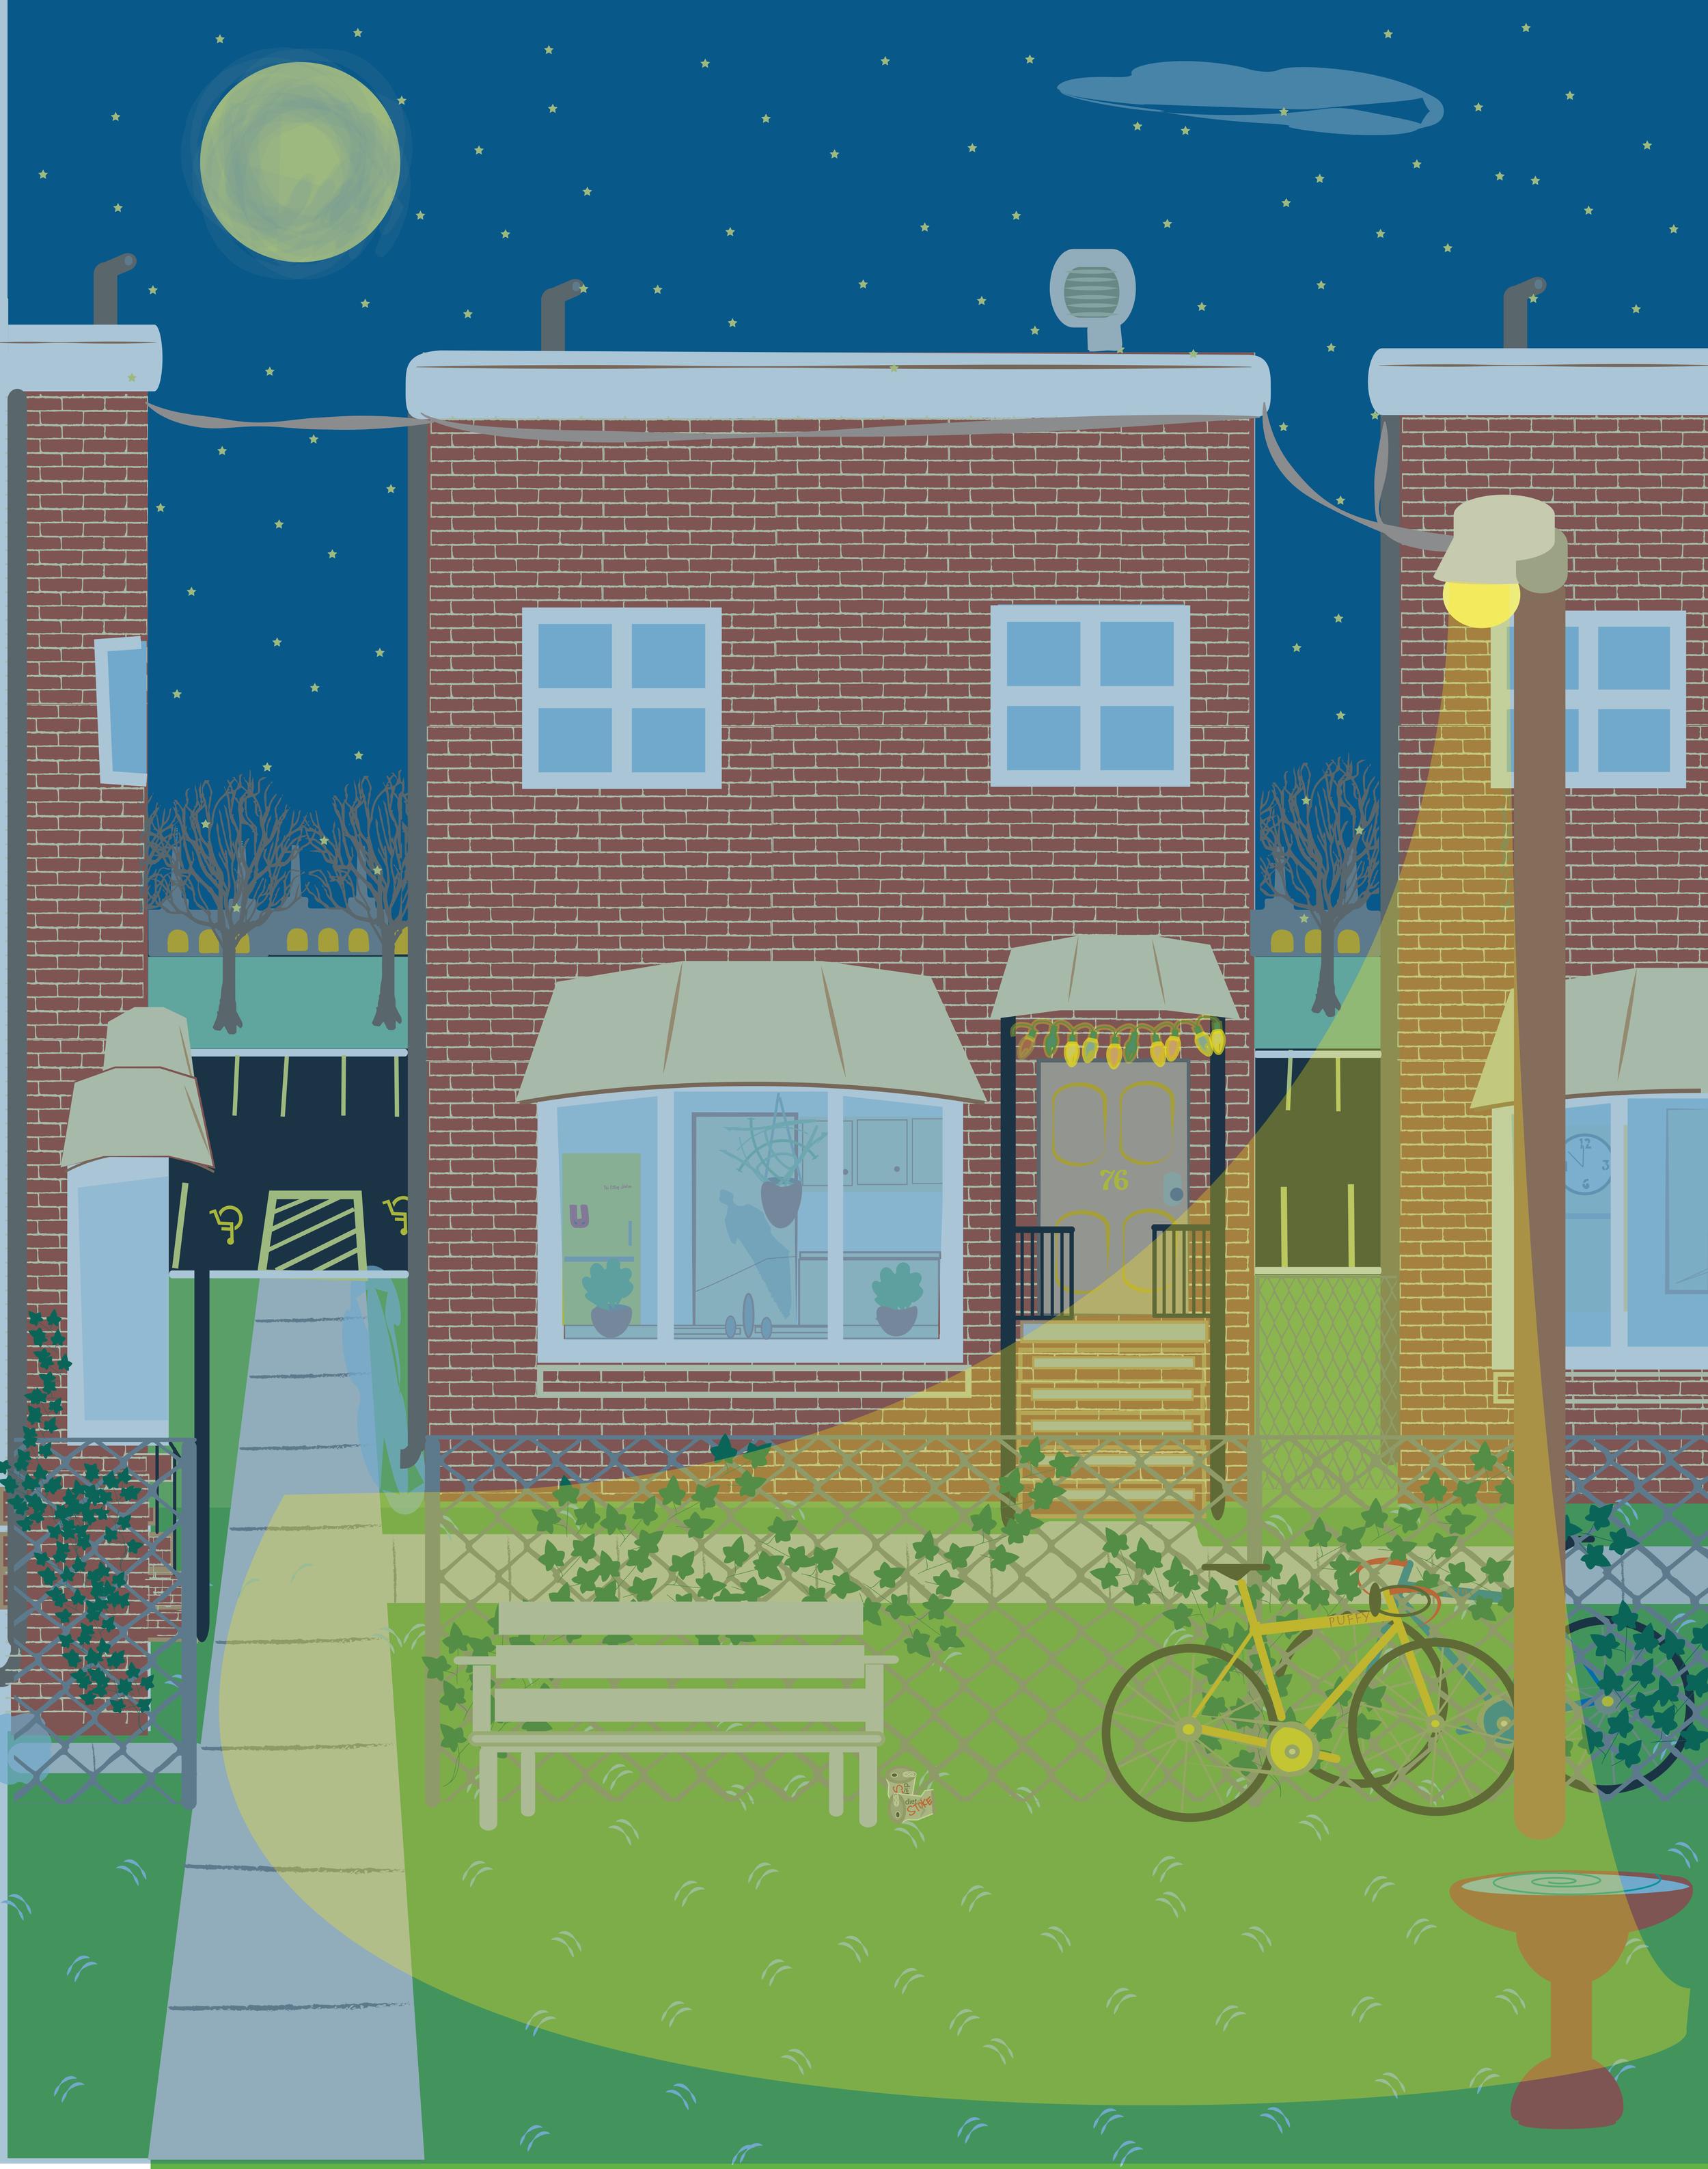 Margaret Kelly courtyard 11 x 17.jpg